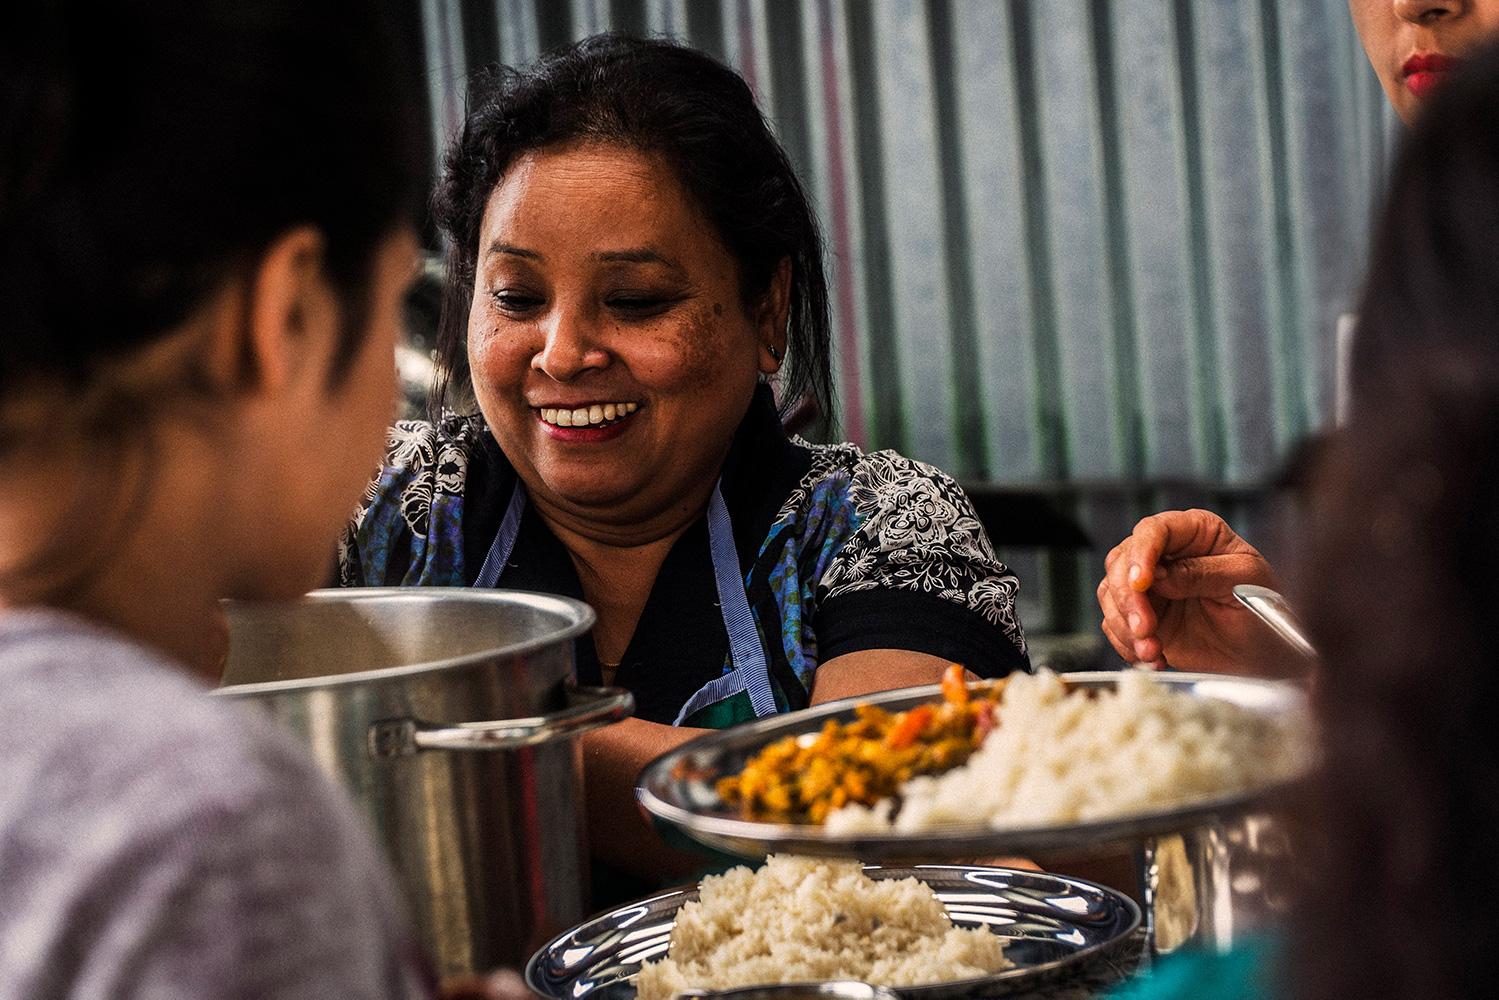 Jivanas-Lunch-Food-Serving-Woman-Rice-Smile-Eating_small.jpg